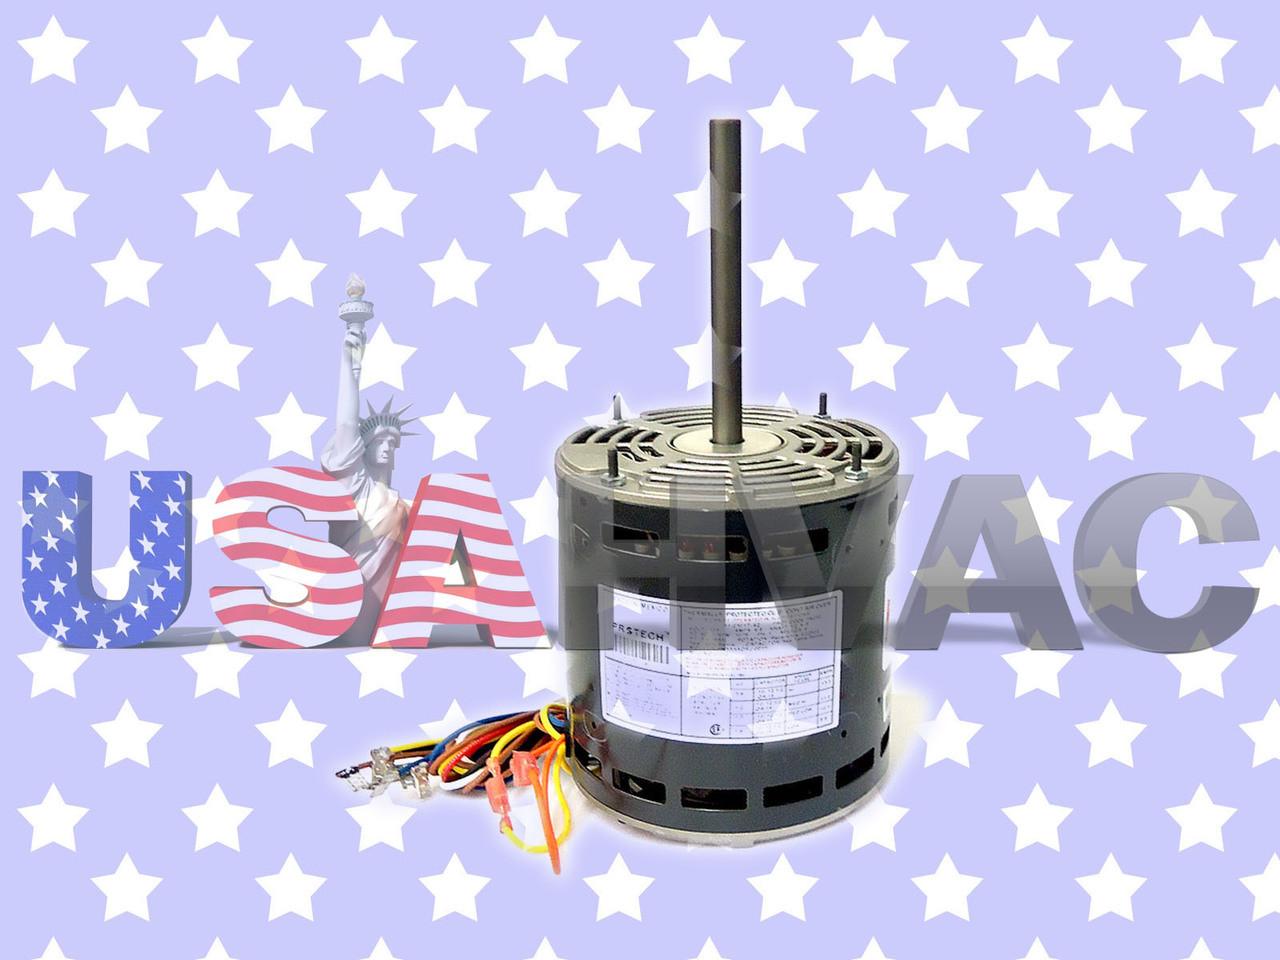 Rheem Ruud Furnace Blower Motor 51-22700-01 51-20816-01 51-23017-41 51-21459-02